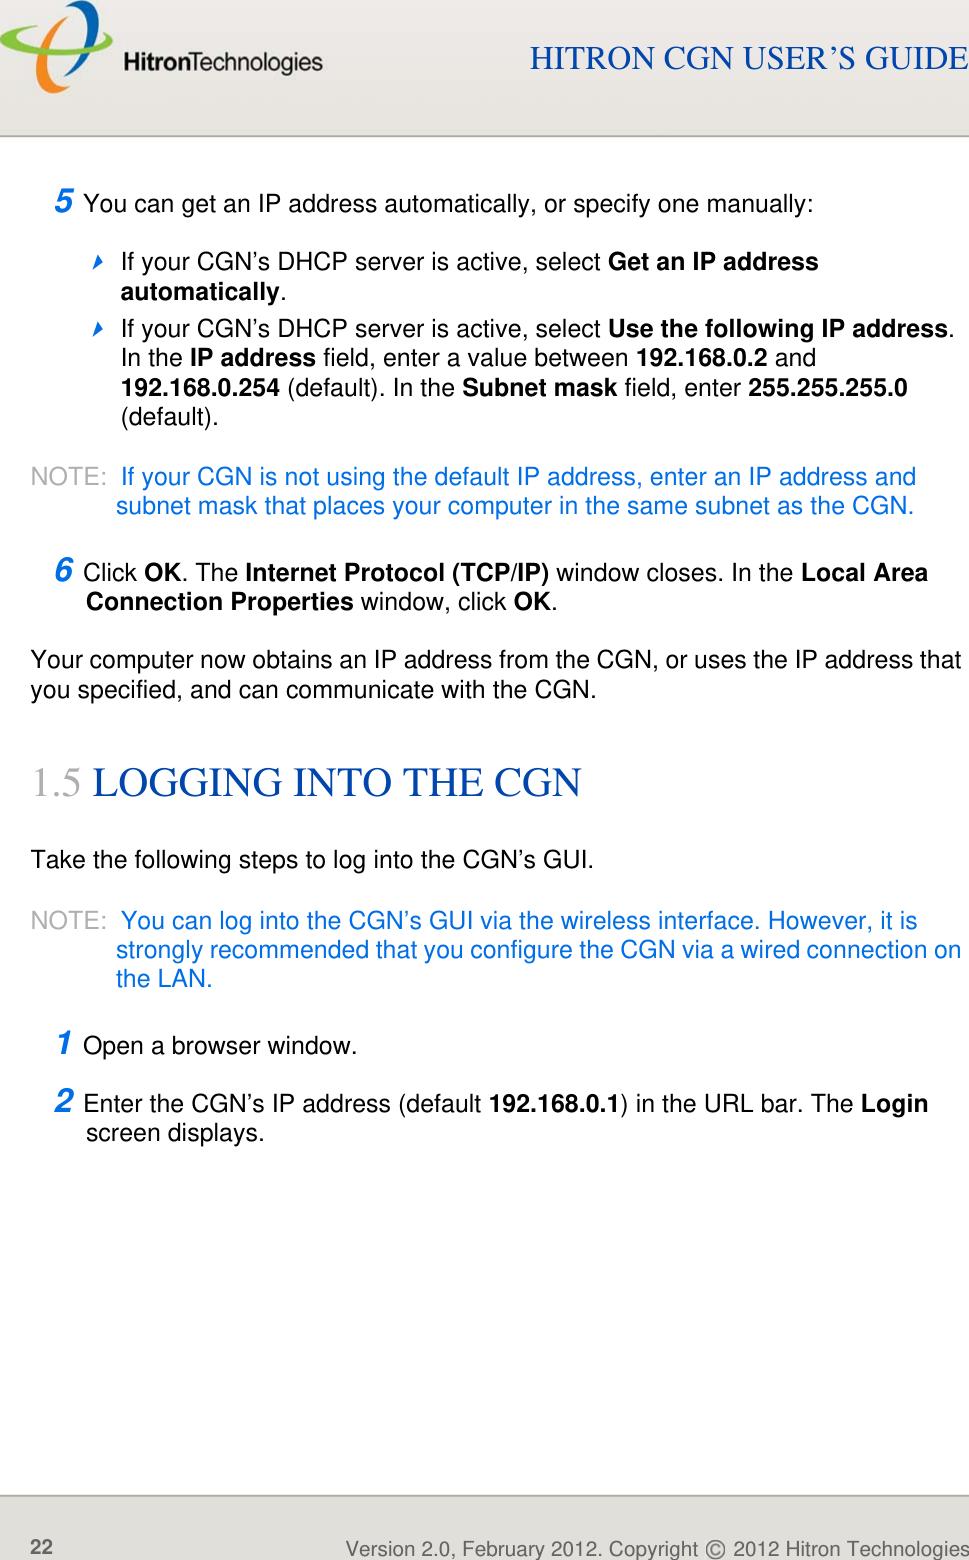 Hitron TECHNOLOGIES CGN01A 3x3 802 11n WiFi Router User Manual